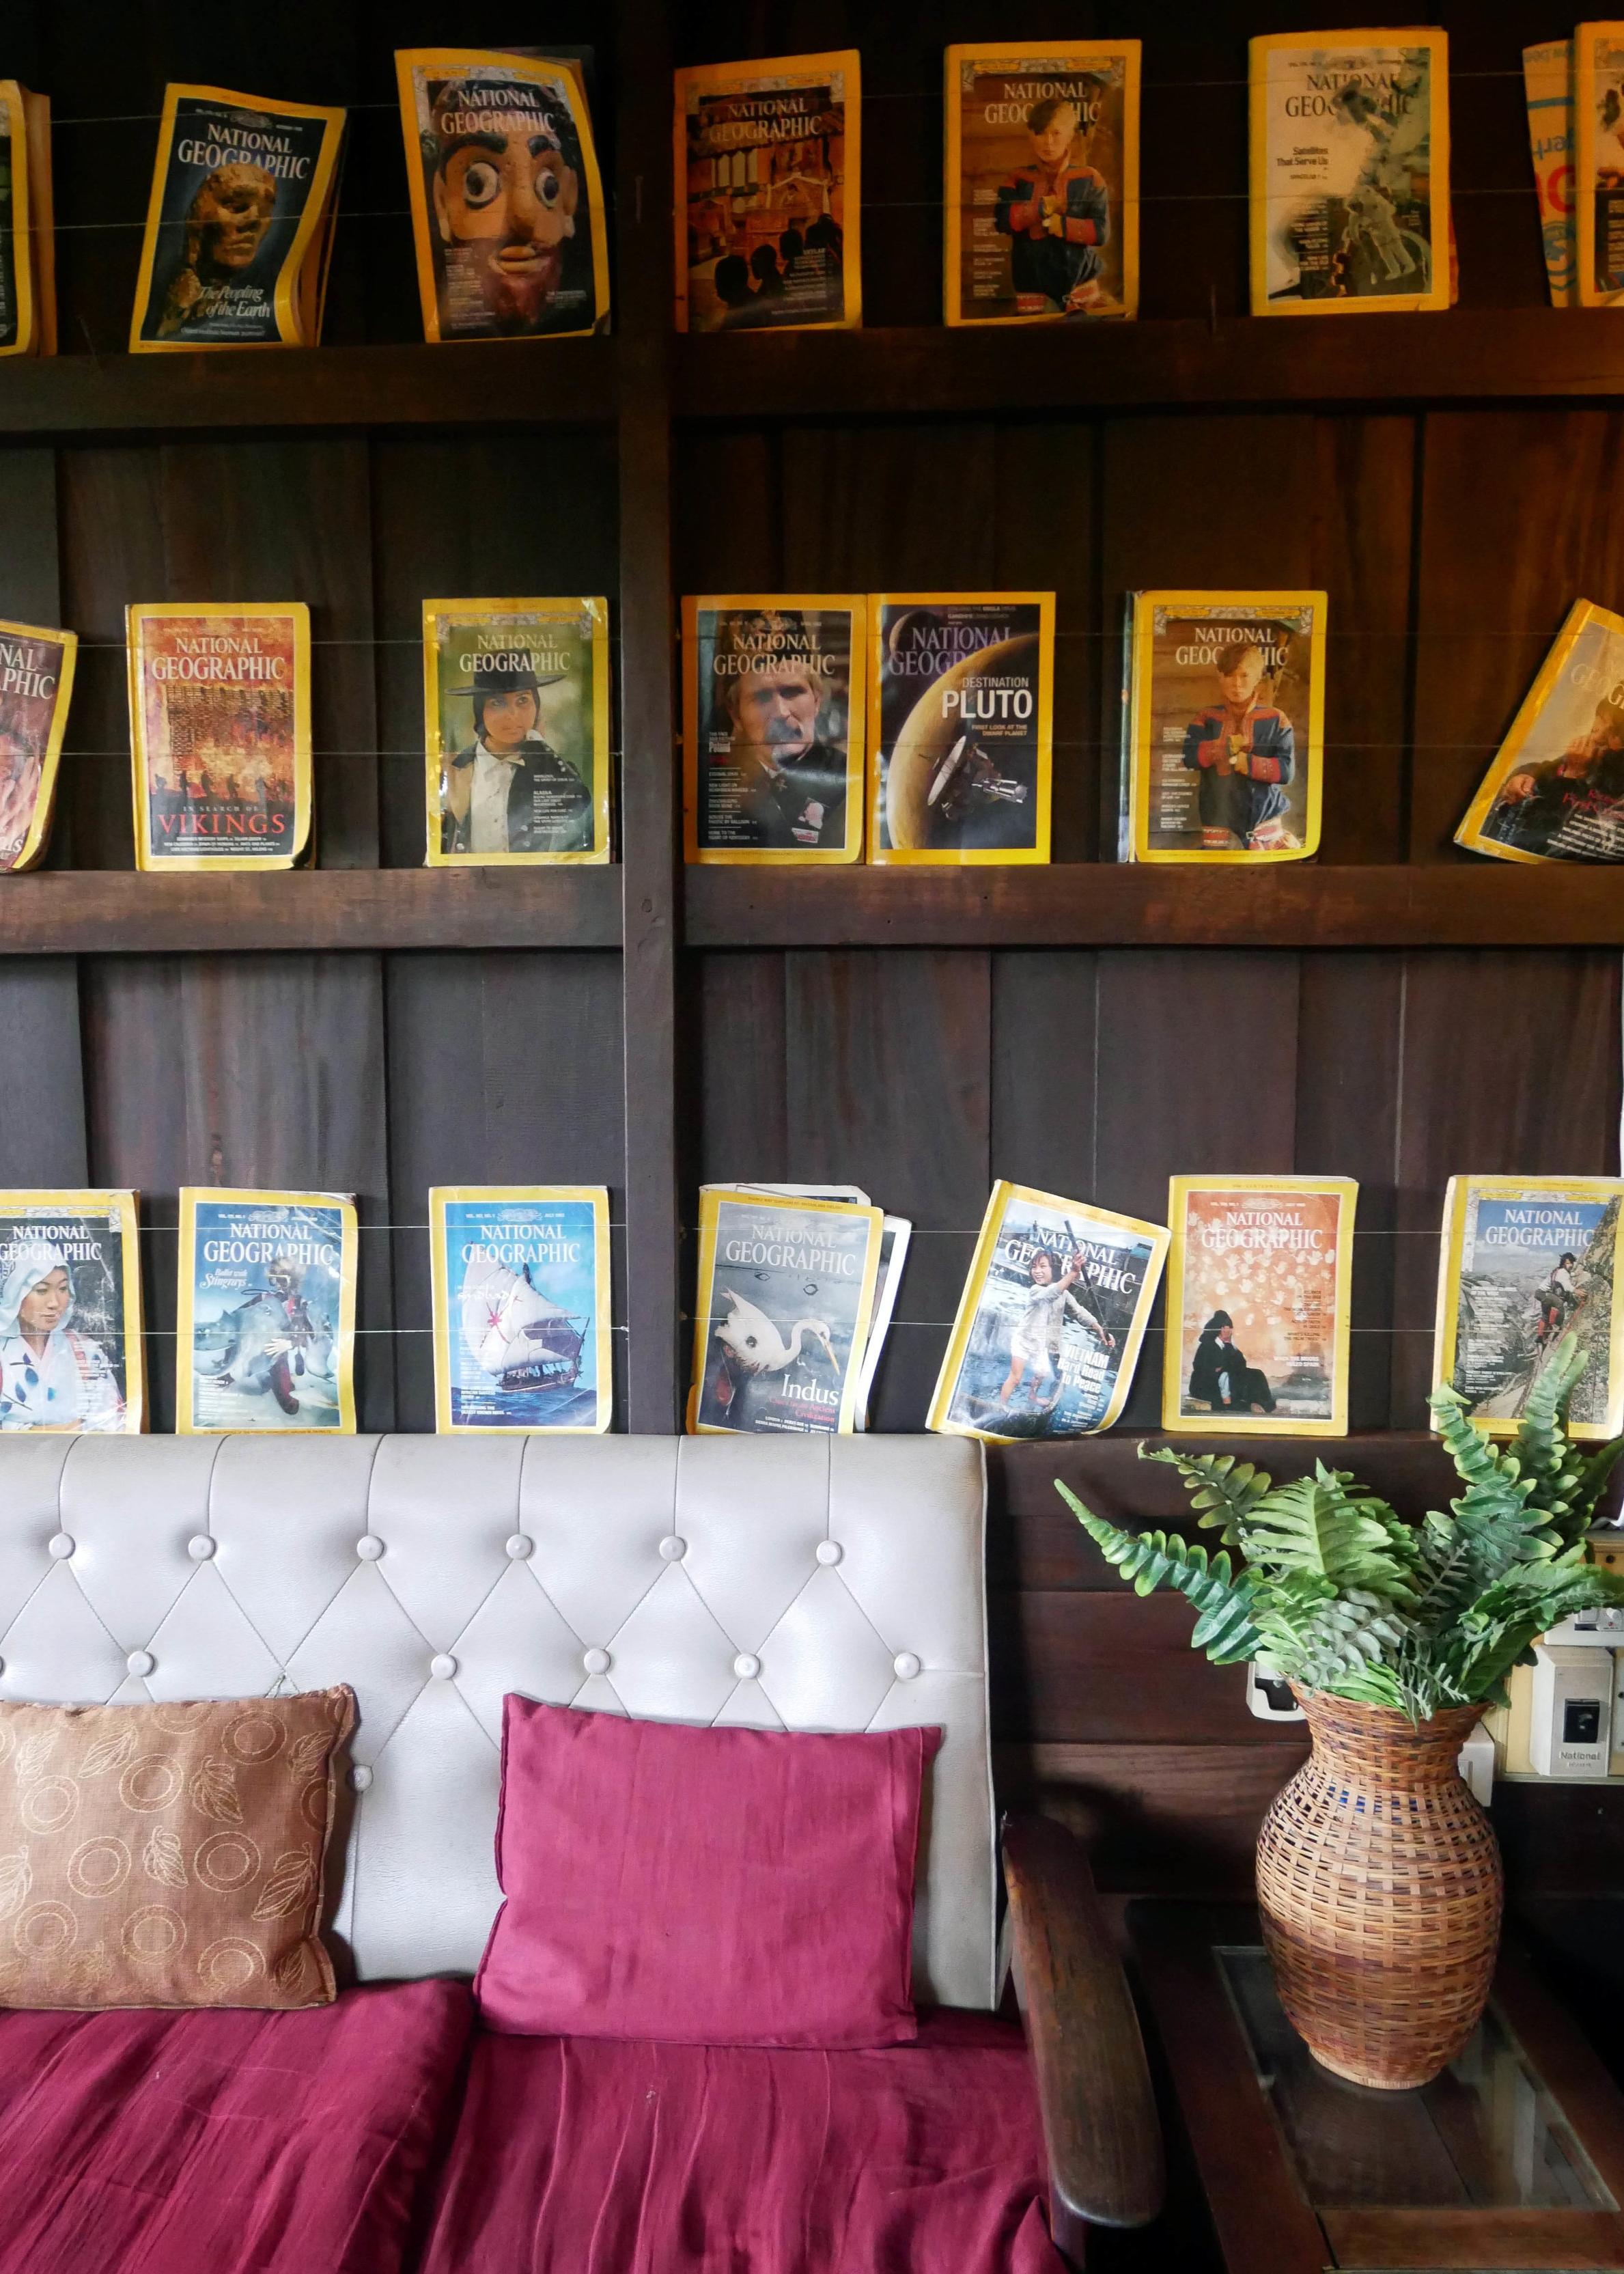 L'Etranger Books and Tea